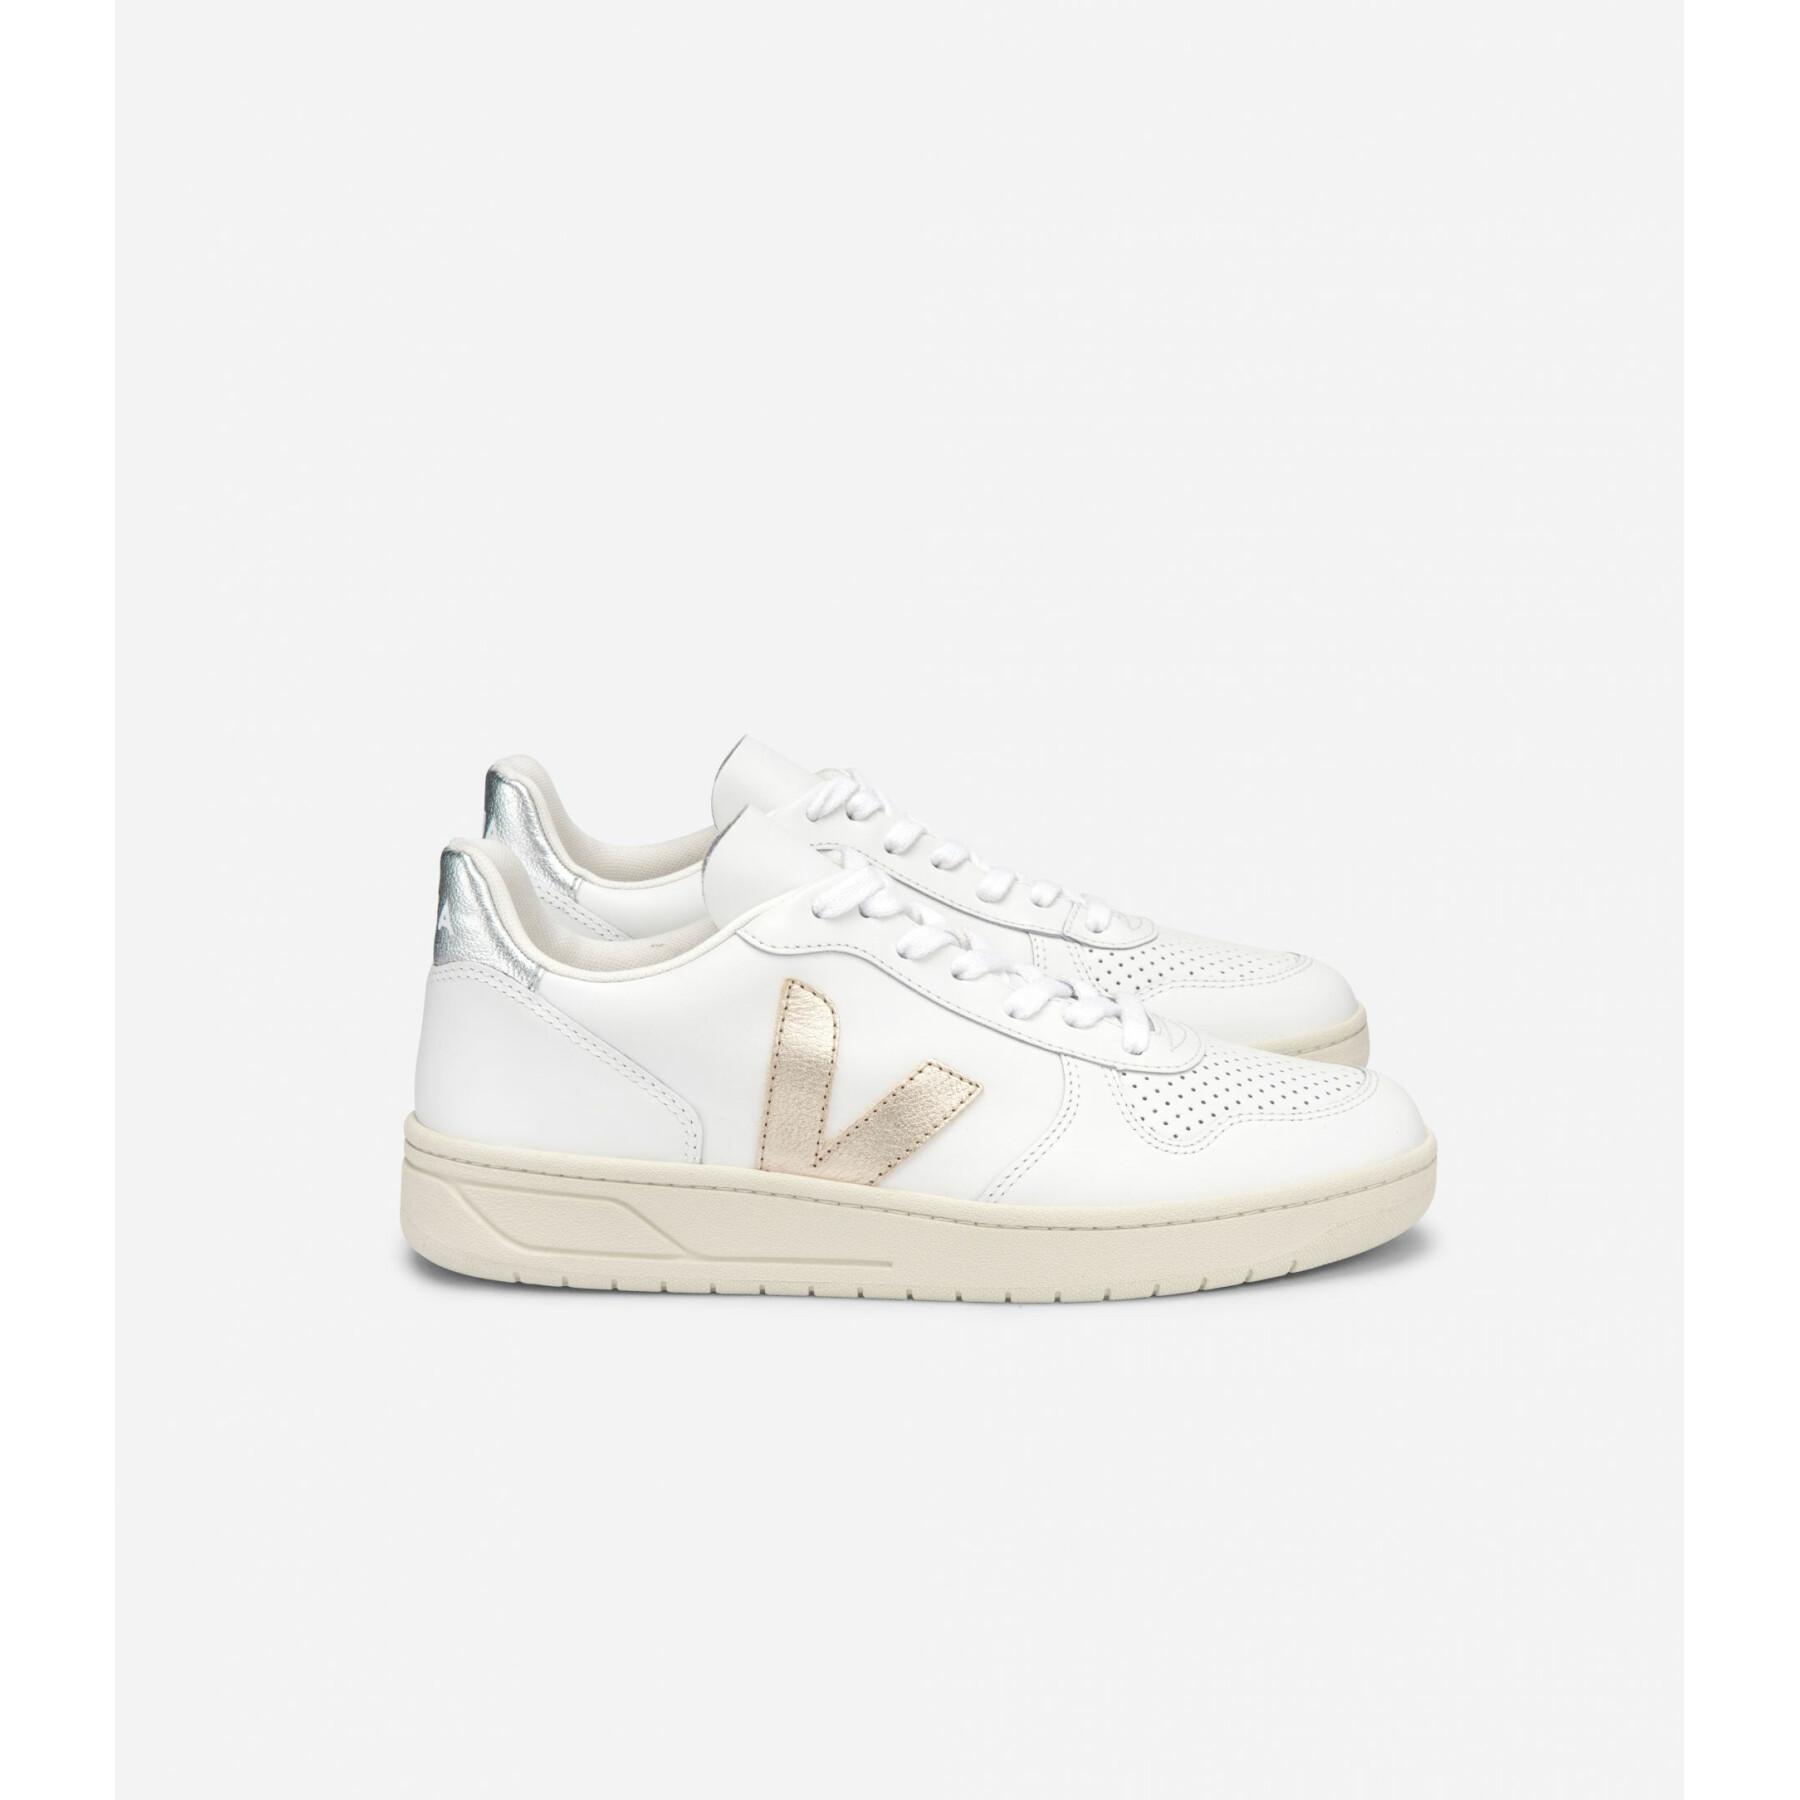 Zapatos de mujer Veja V-10 Leather